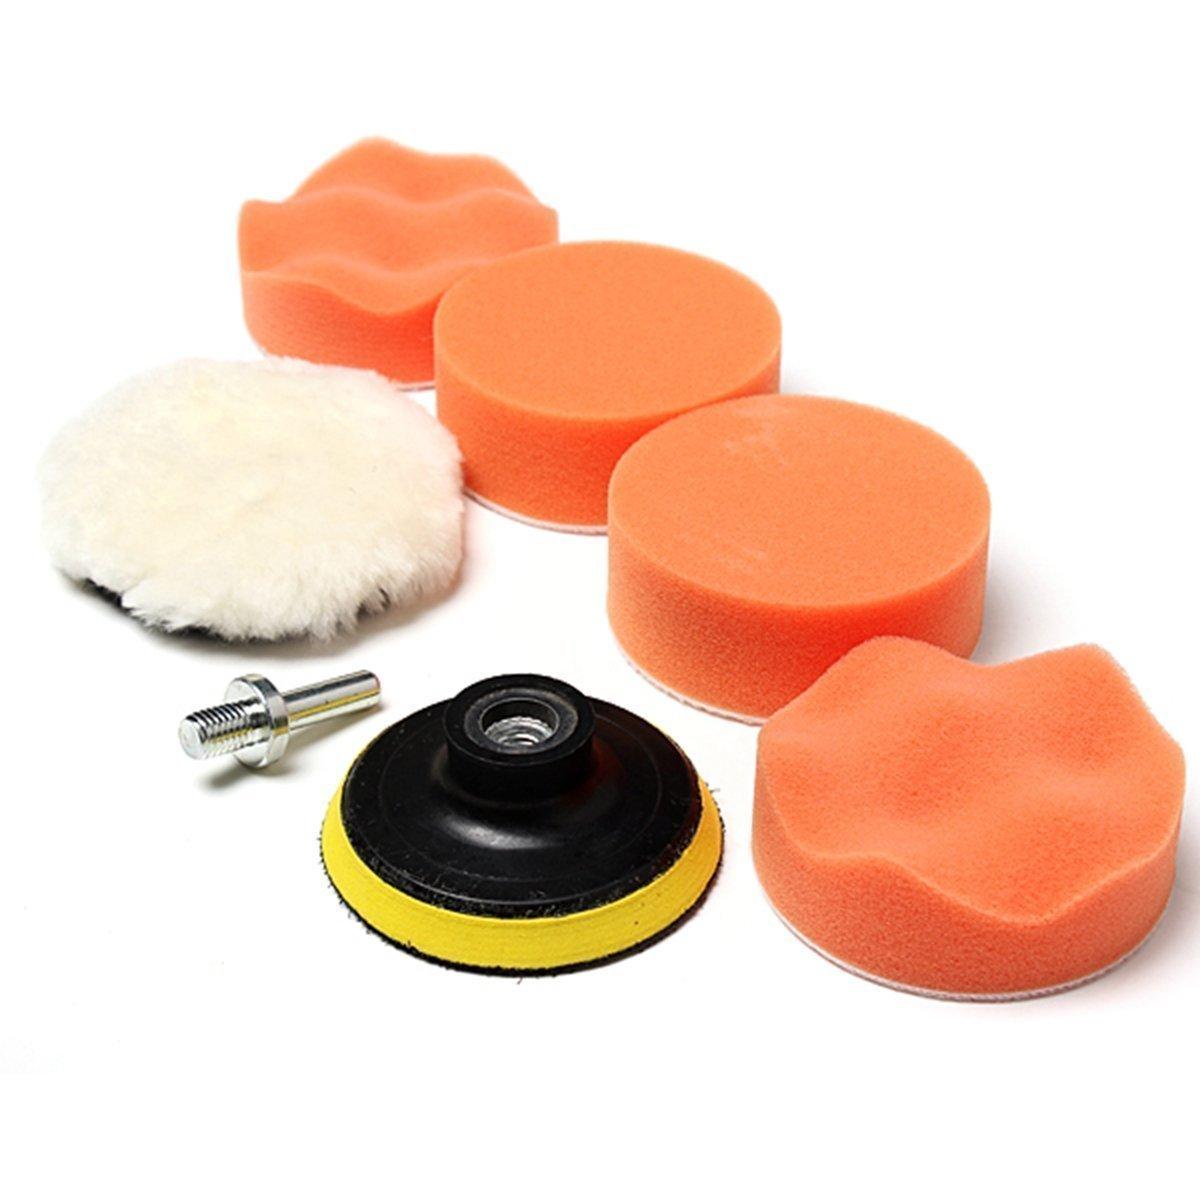 MAXGOODS 7Pcs/Set Esponja de Pulido Abrillantar para Pulir Encerar Espuma con Adaptador de Taladro para Lijado de Coche Automó vil Auto Color Naranja Pad Kit Limpiar